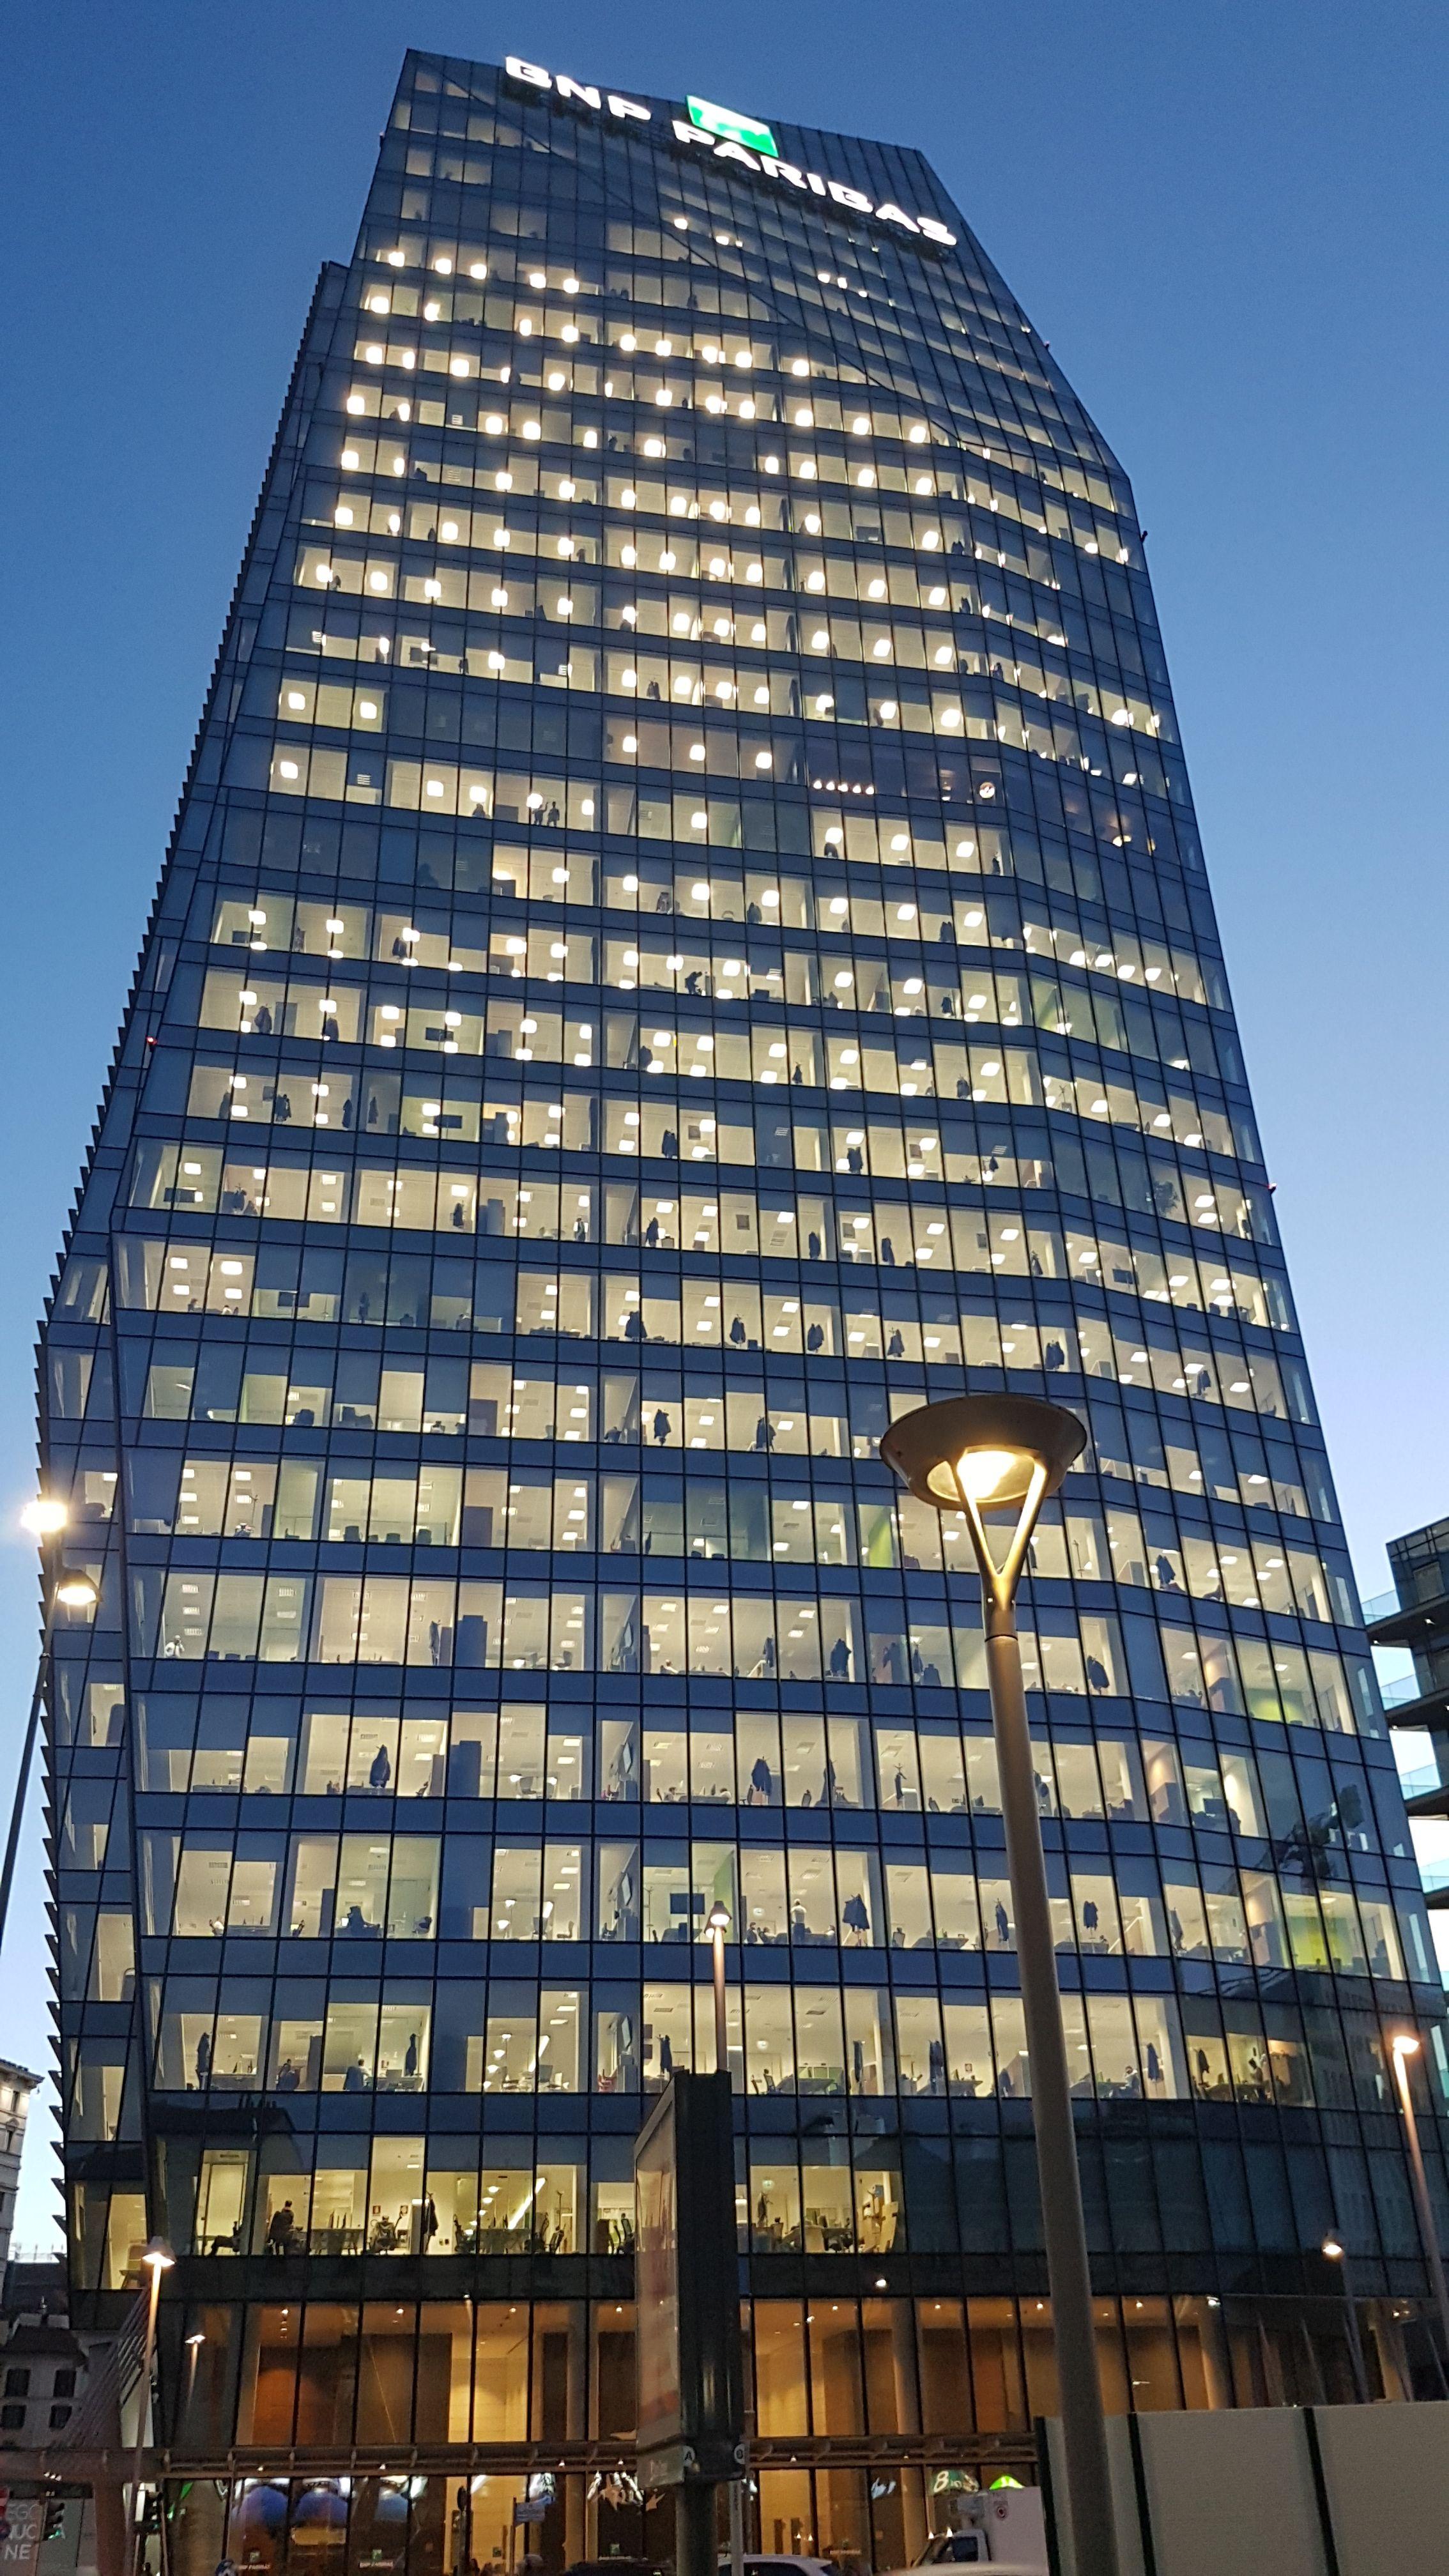 0d95c263b BNP Paribas headquarters, Milano 2018 | milano milan mailand ...